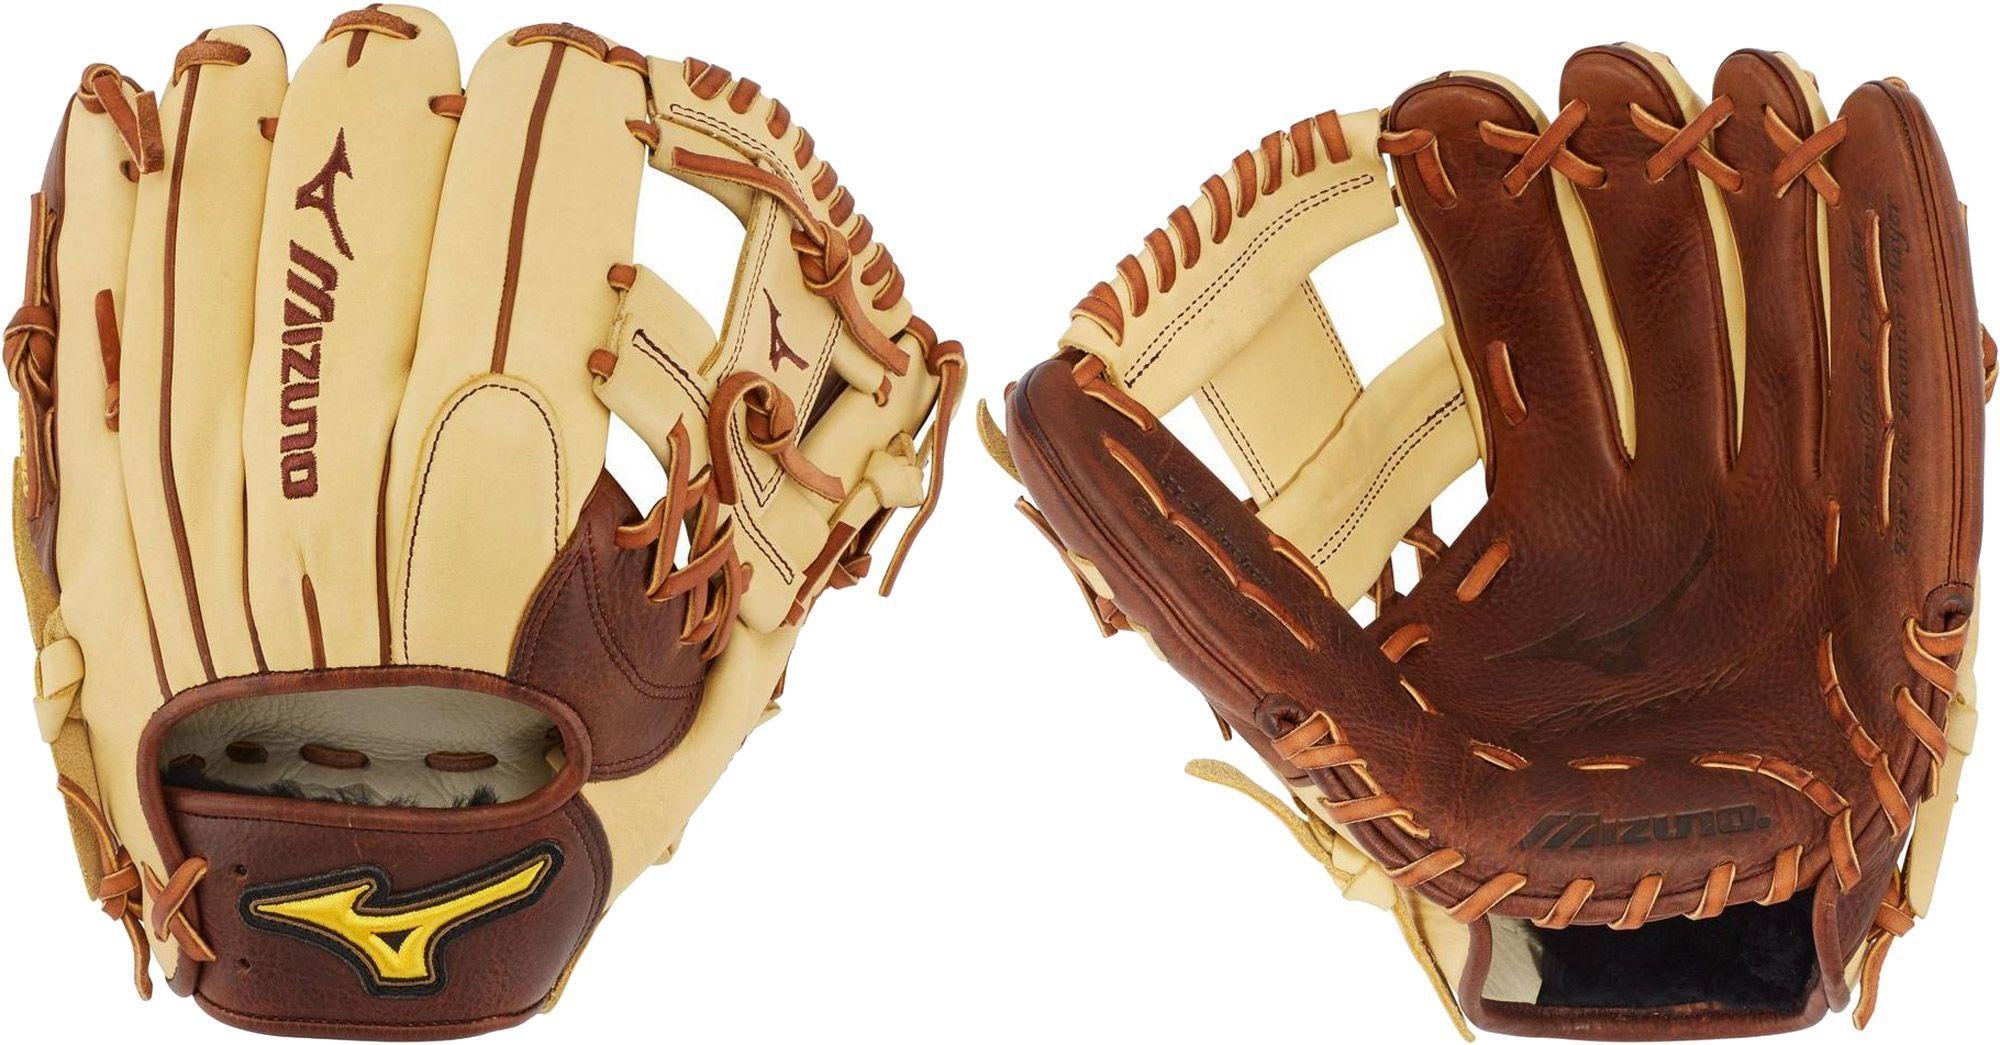 Mizuno 11.25'' Classic Pro Soft Series Glove 2019 | Products